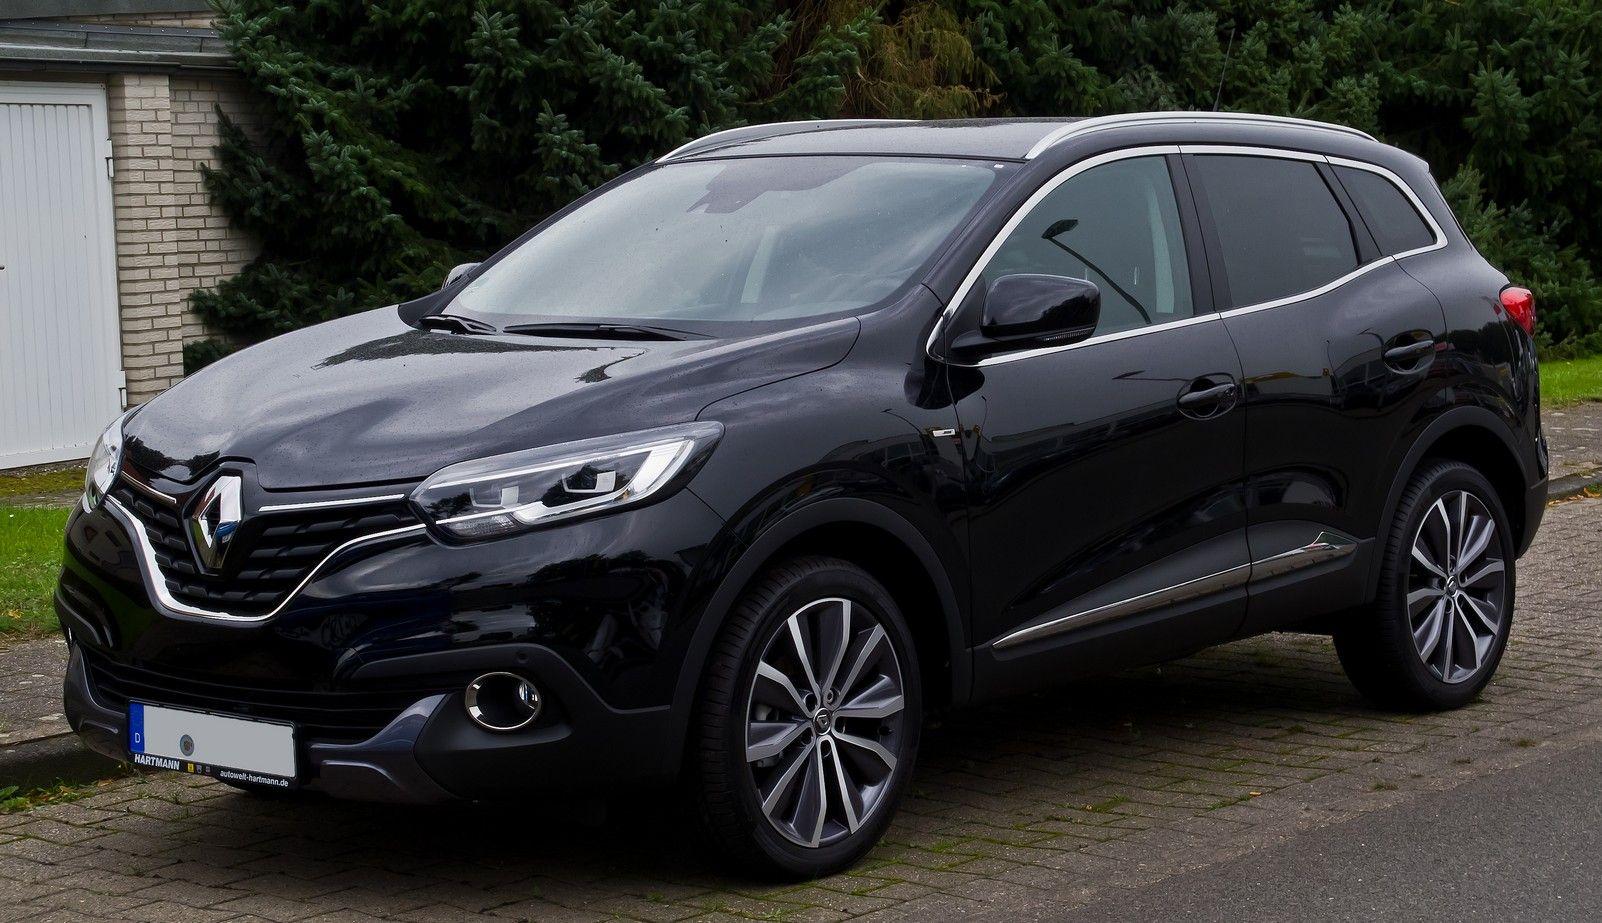 2019 Renault Kadjar New Suv